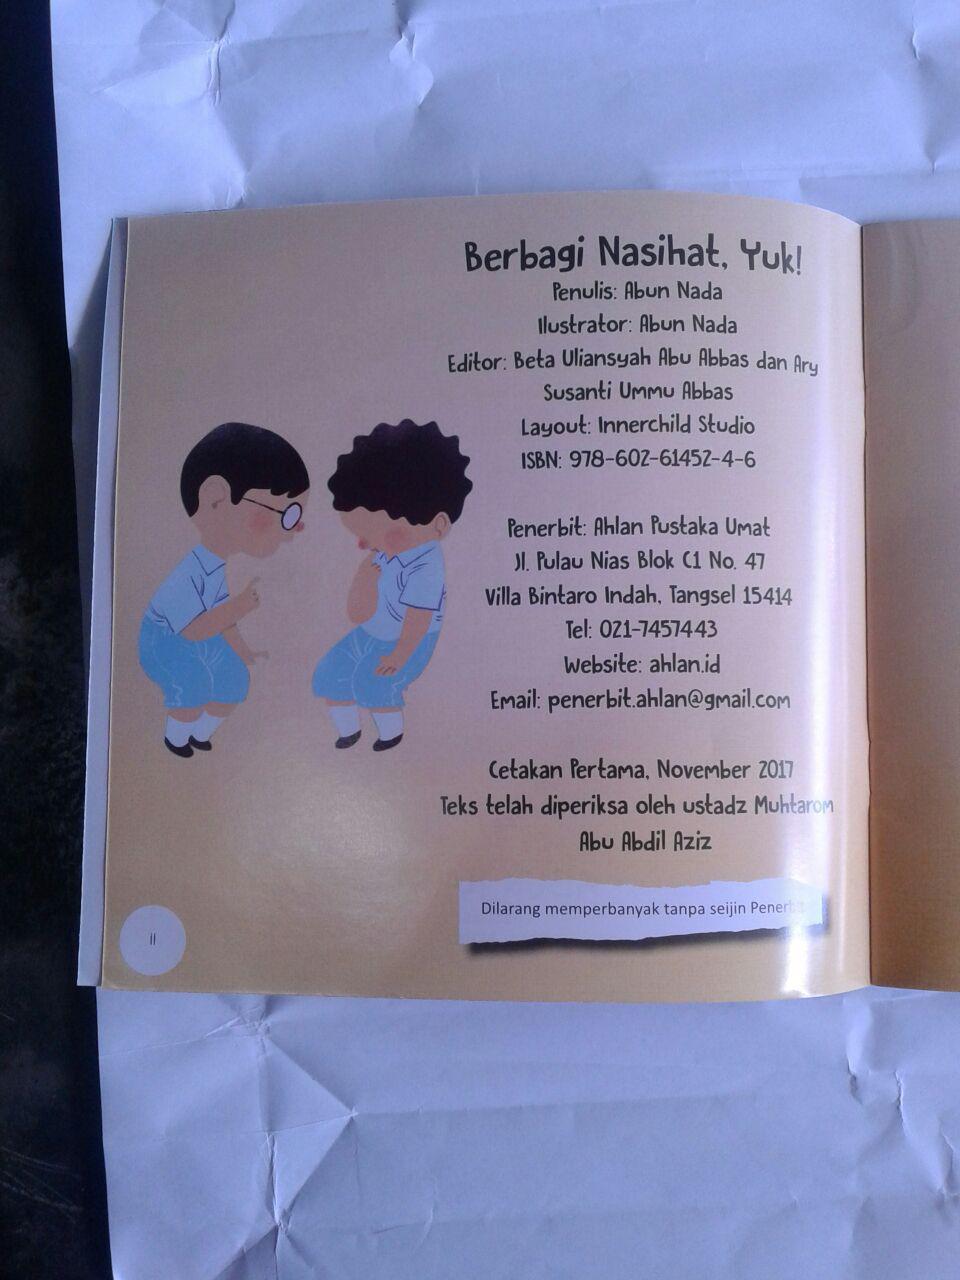 Buku Anak Berbagi Nasihat Yuk isi